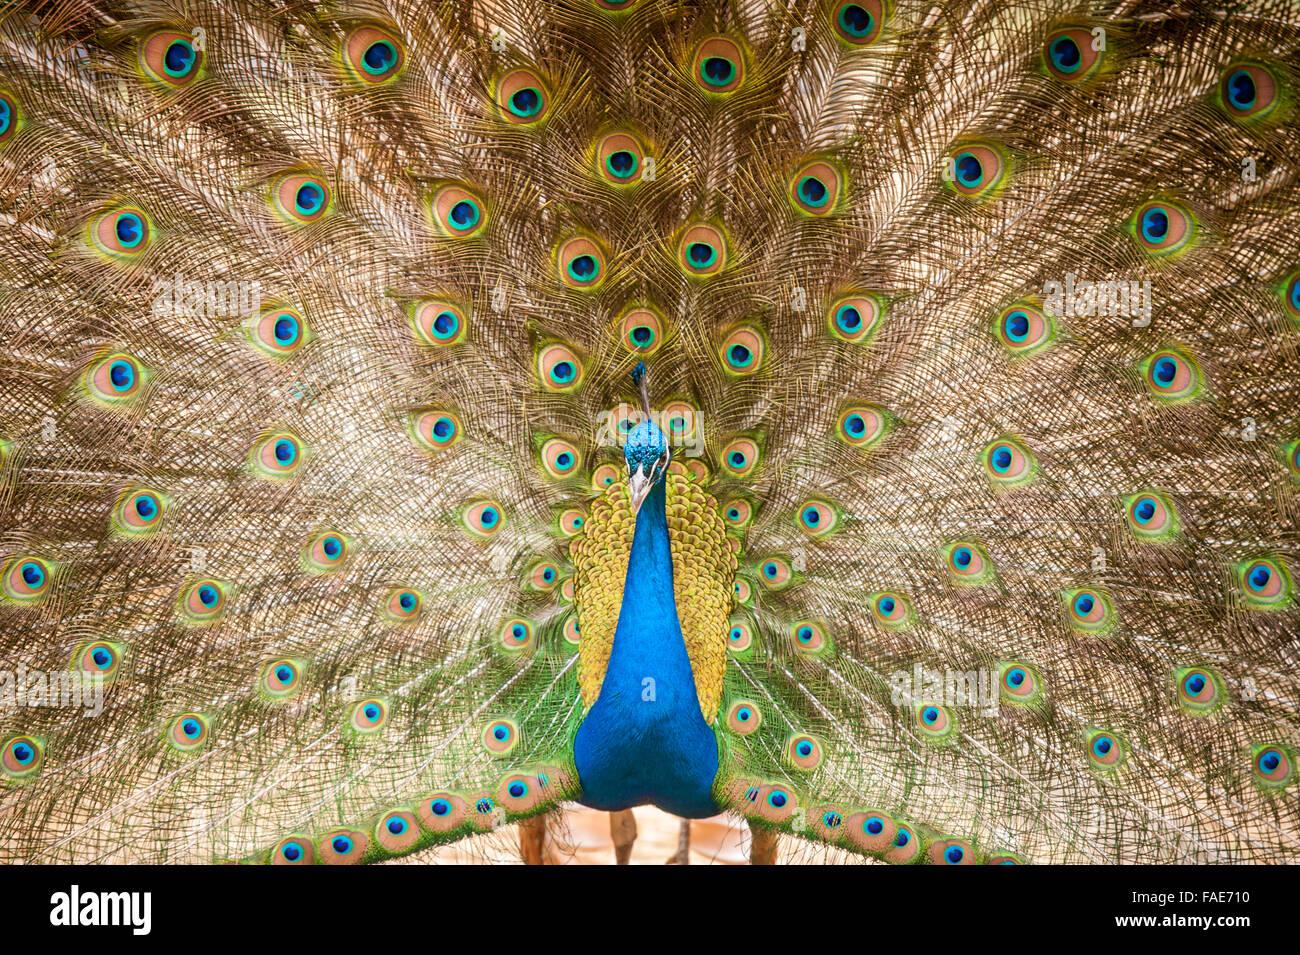 Bright peacock. - Stock Image